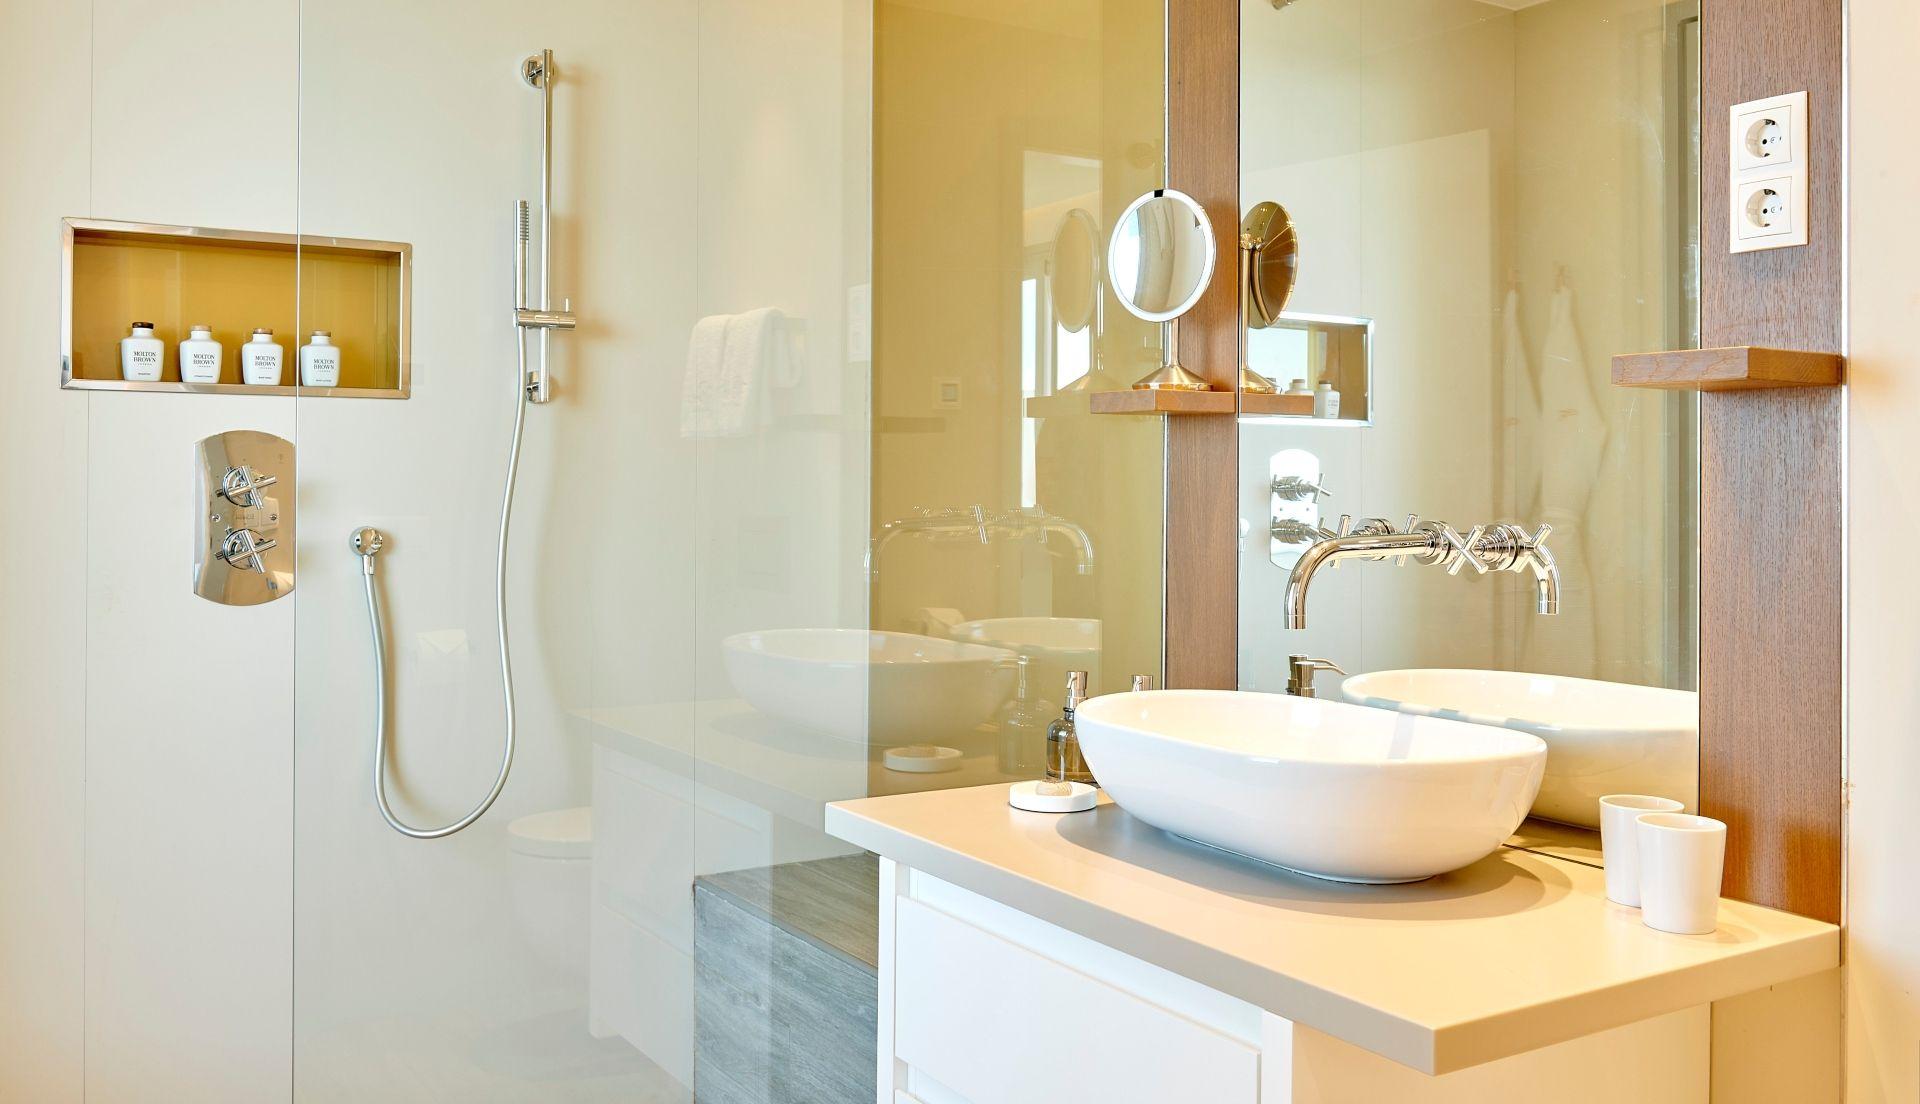 Cliff Suite Duplex Deluxe bathroom